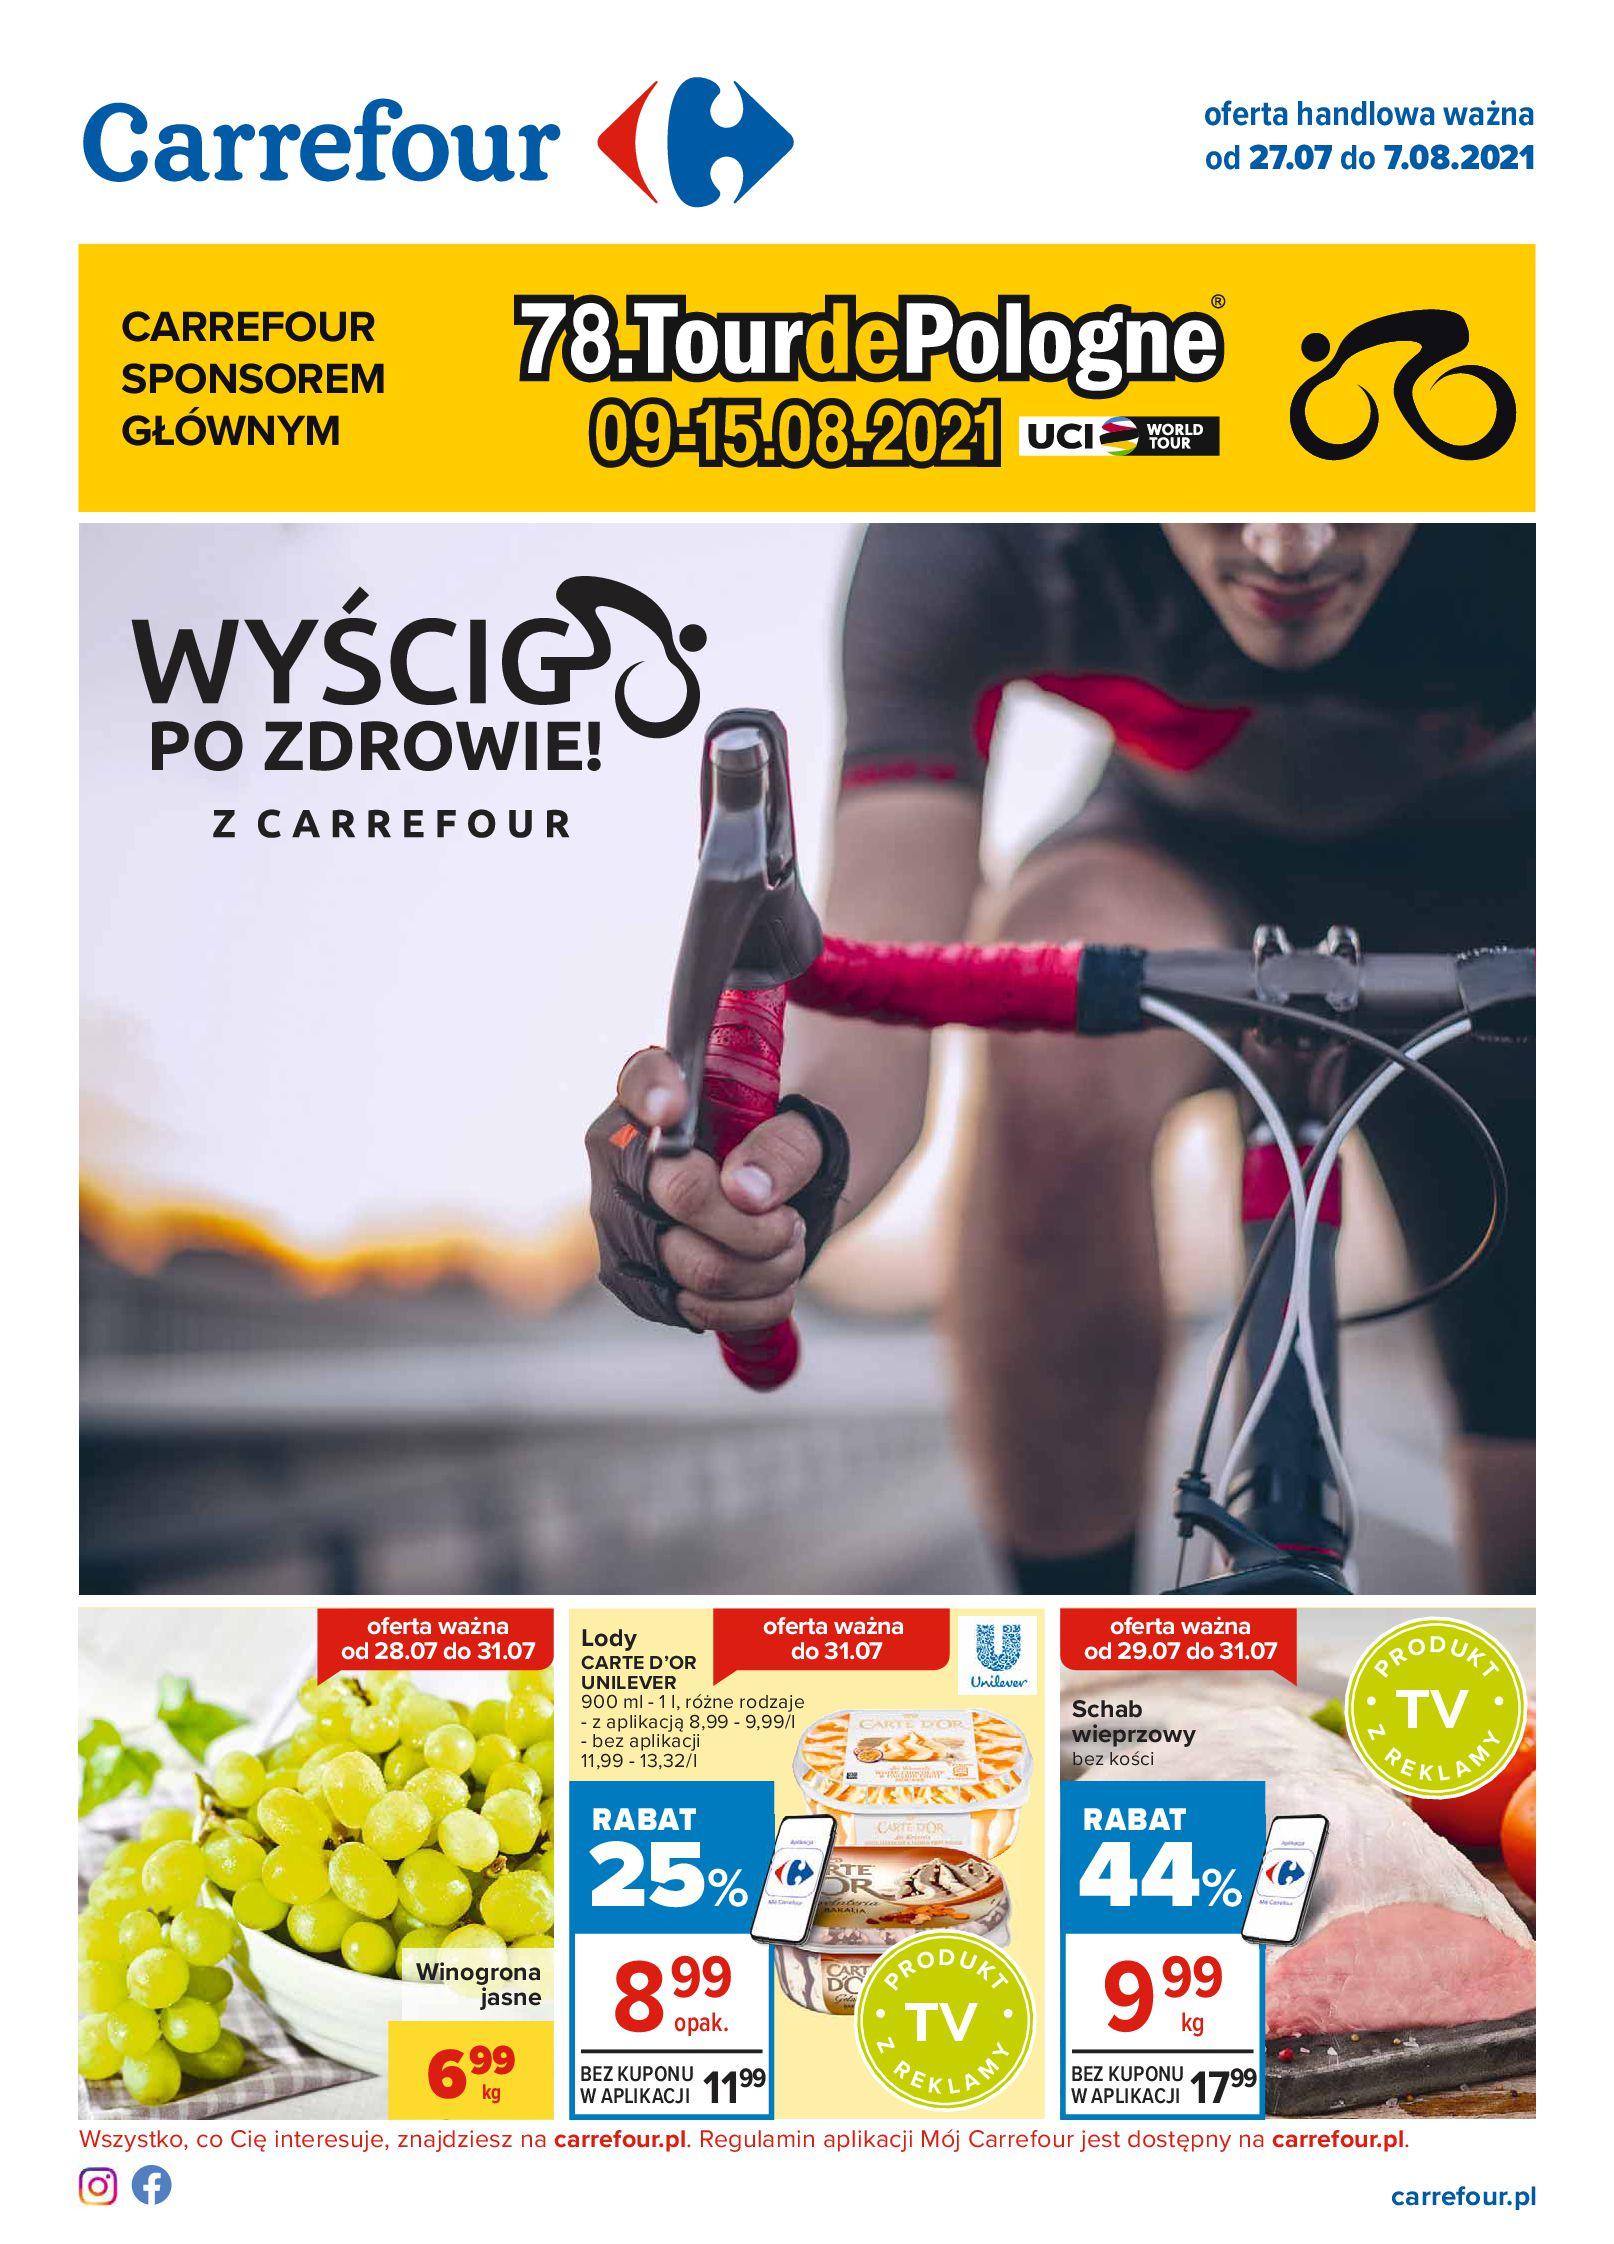 Carrefour:  Gazetka Carrefour - Oferta handlowa 26.07.2021